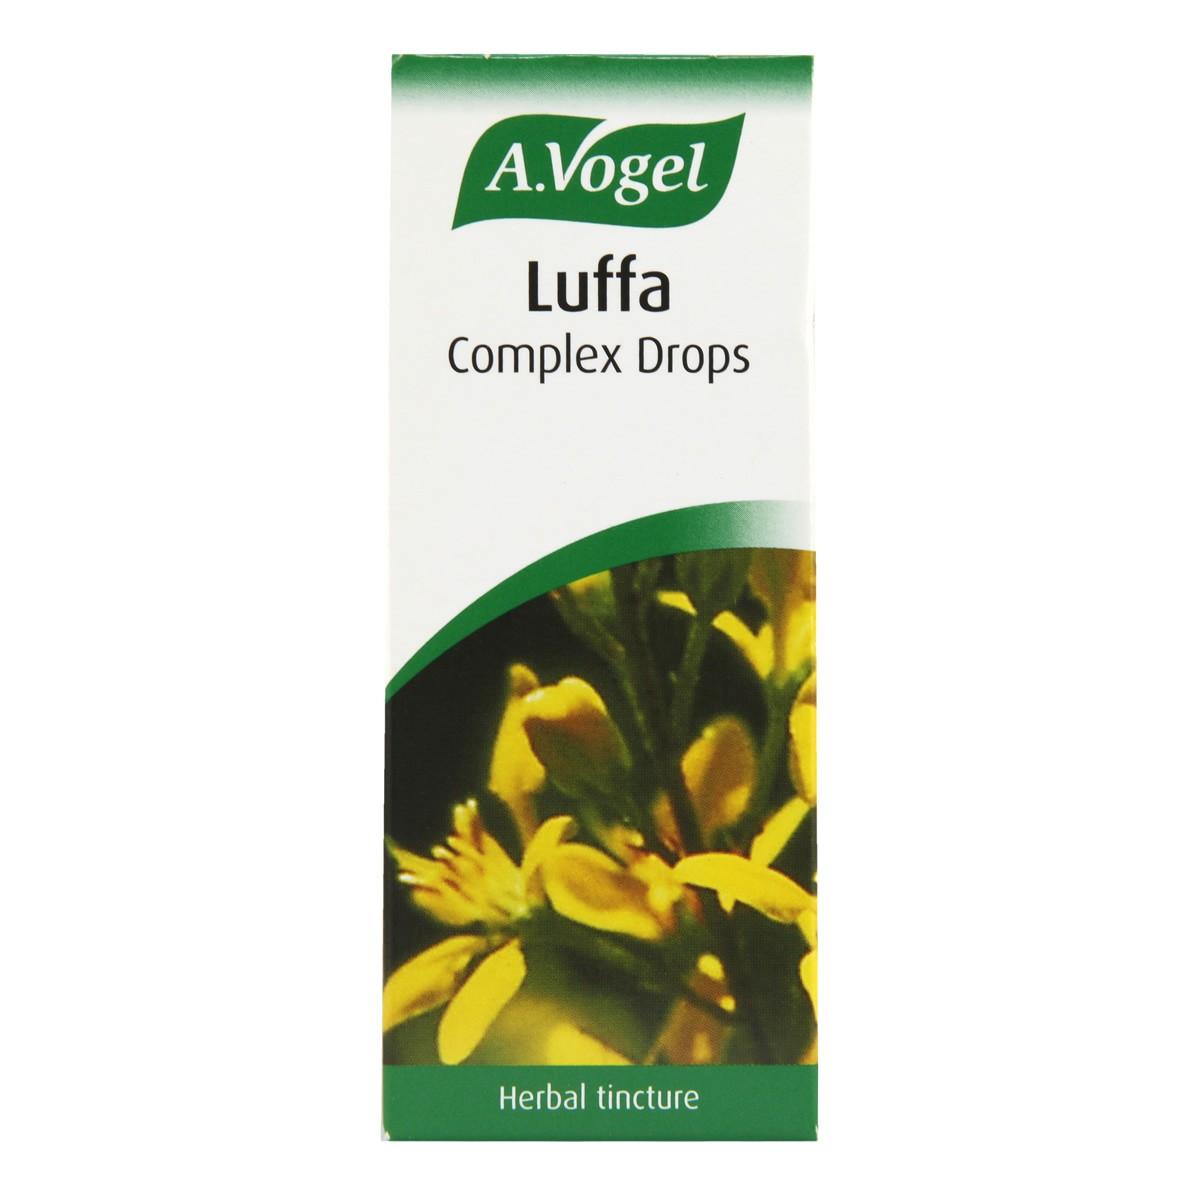 A.Vogel Luffa Complex Drops